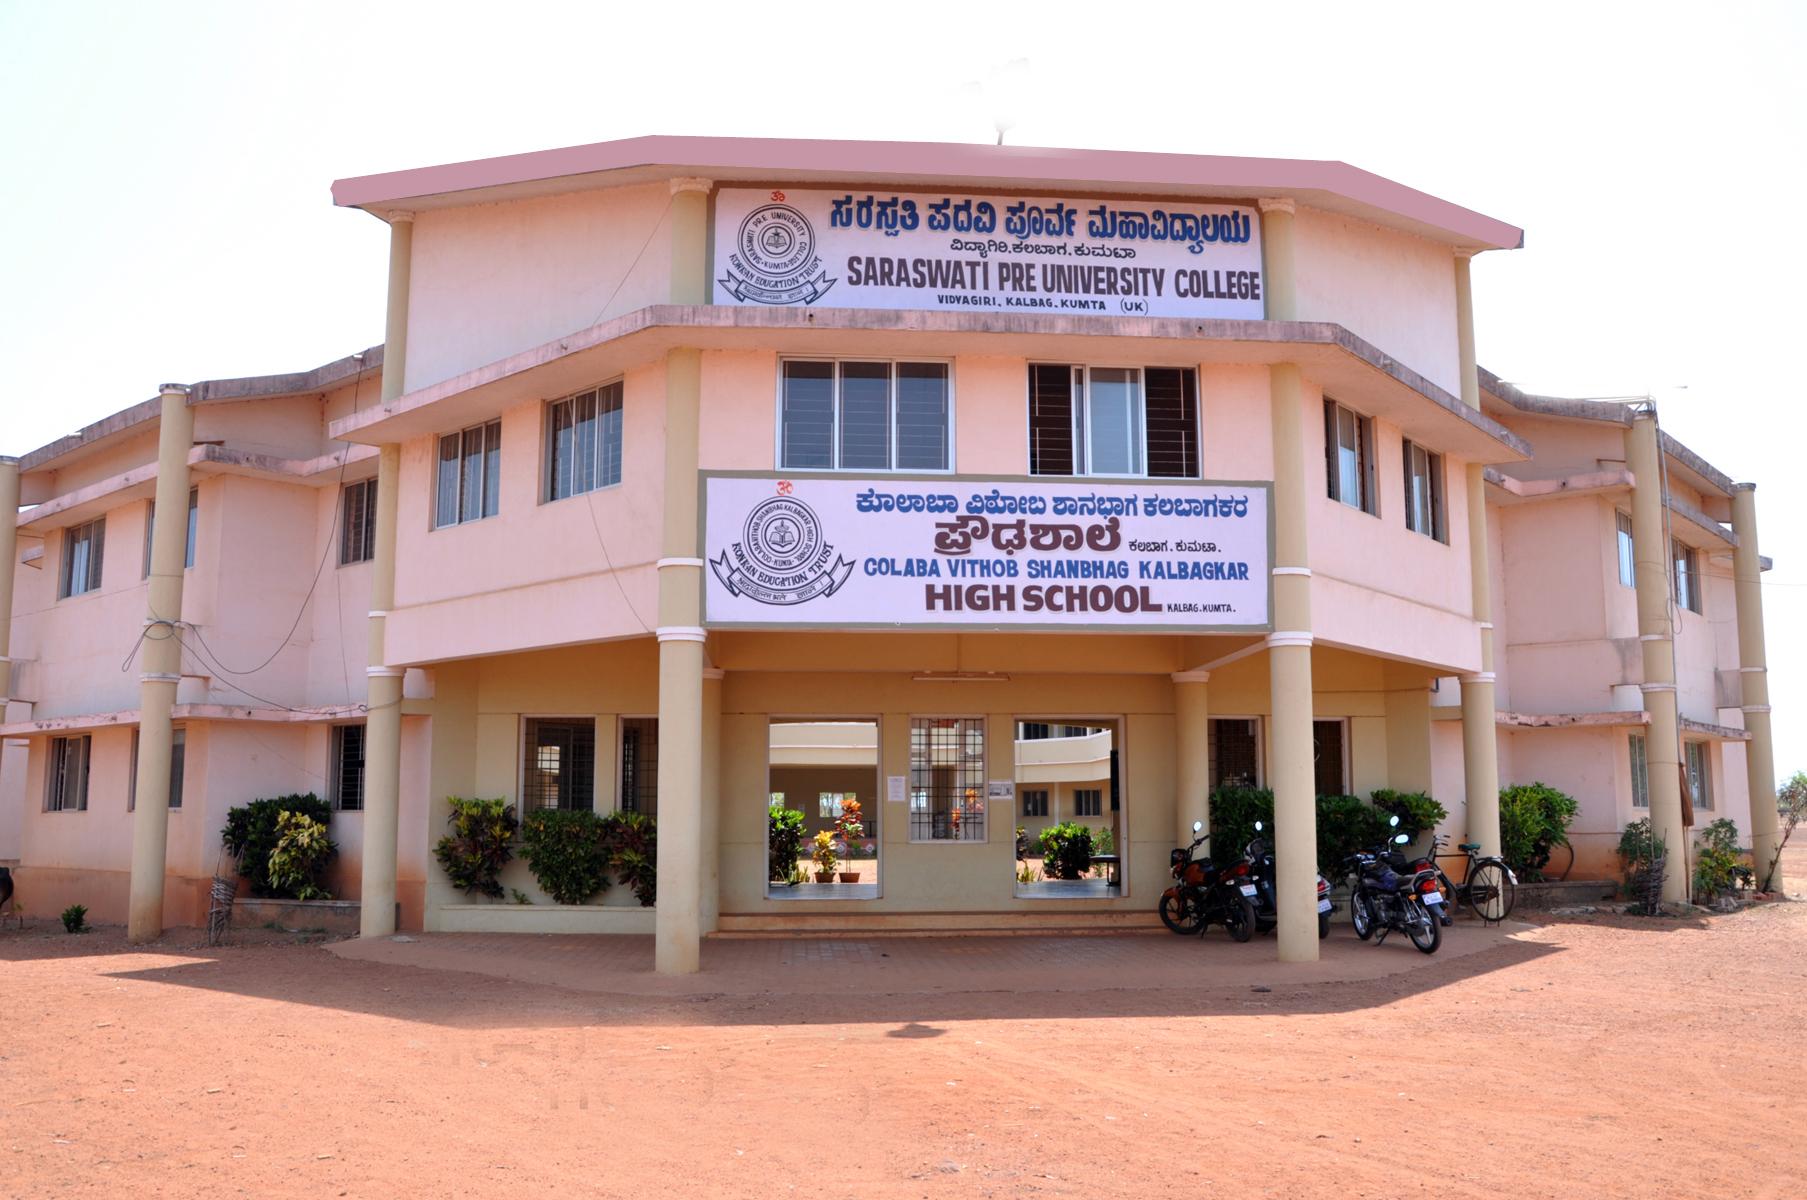 Colaba Vithob Shanbhag Kalbagkar (CVSK) High School